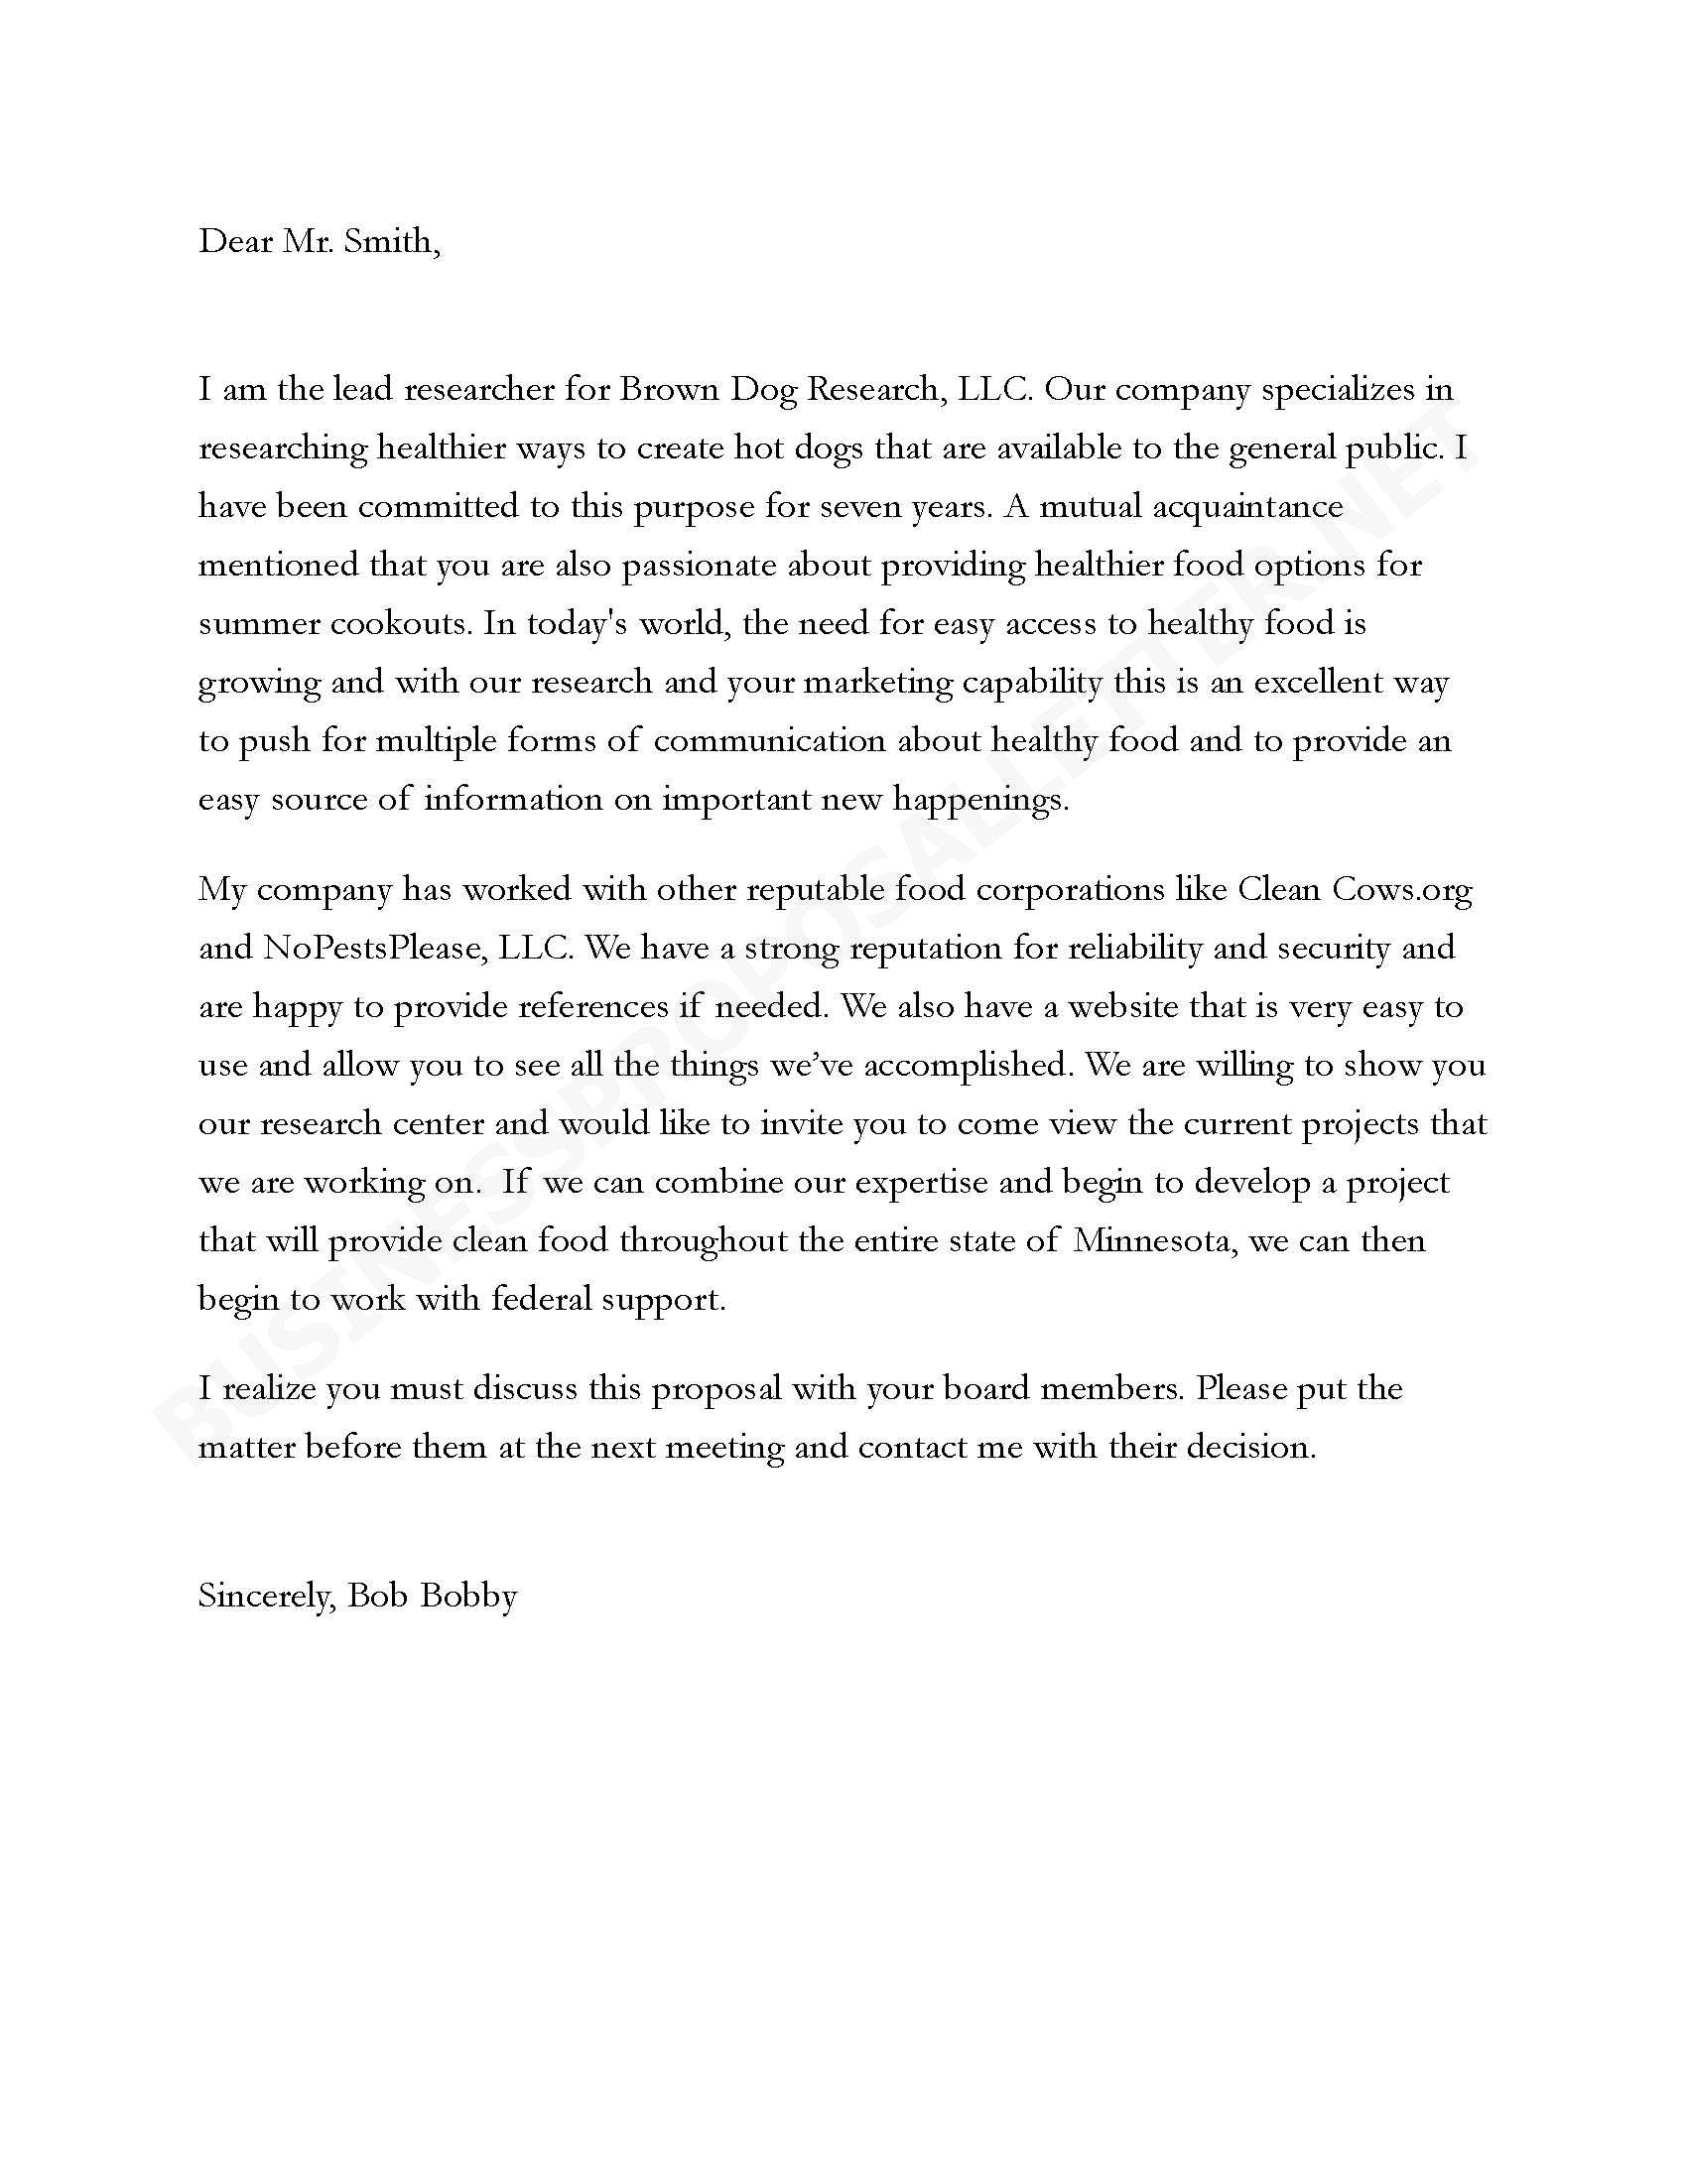 005 Essay Proposal Business Letter Sample Top Apa Format Example Samples Full